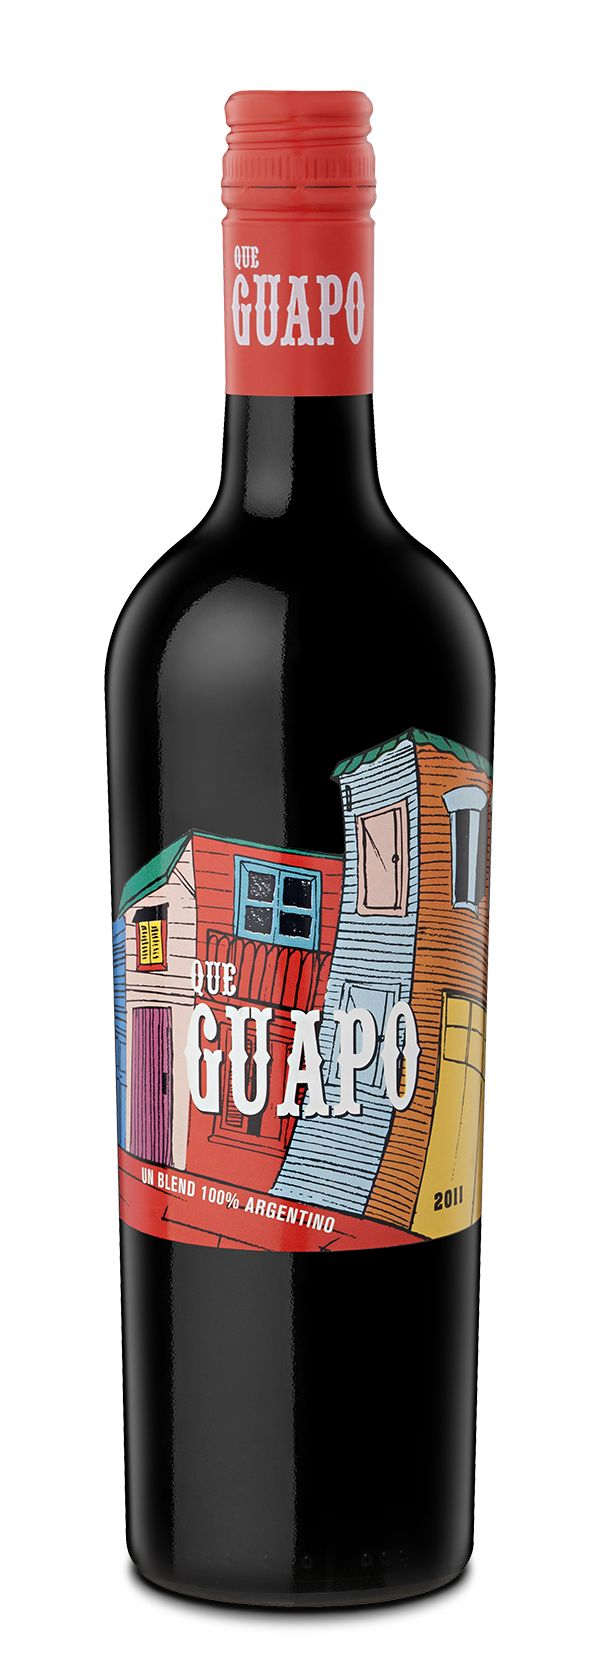 Que Guapo! by Estudio Iuvaro, via Behance